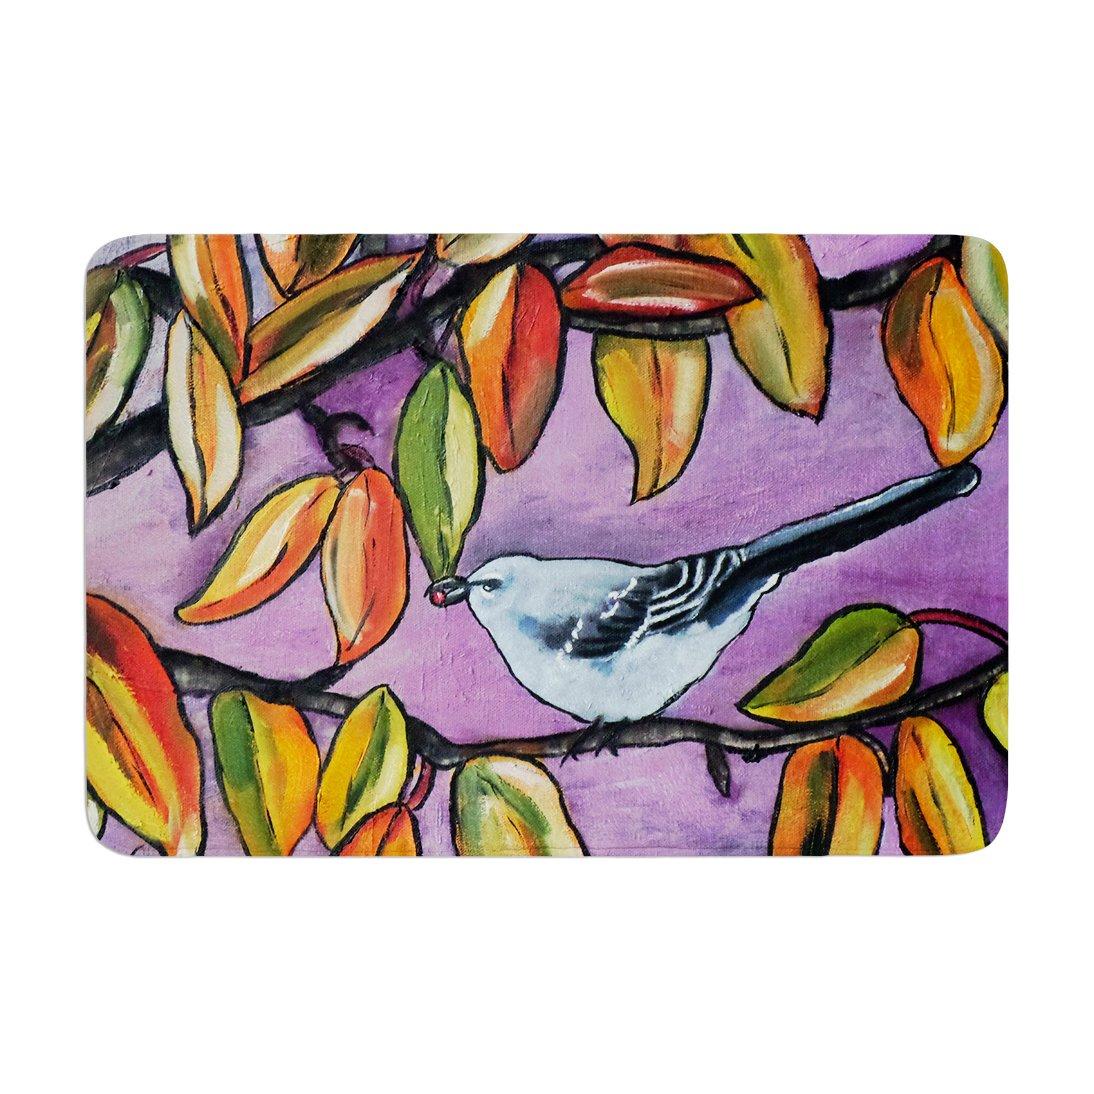 17 by 24 Kess InHouse Cathy Rodgers Mockingbird Purple Orange Memory Foam Bath Mat